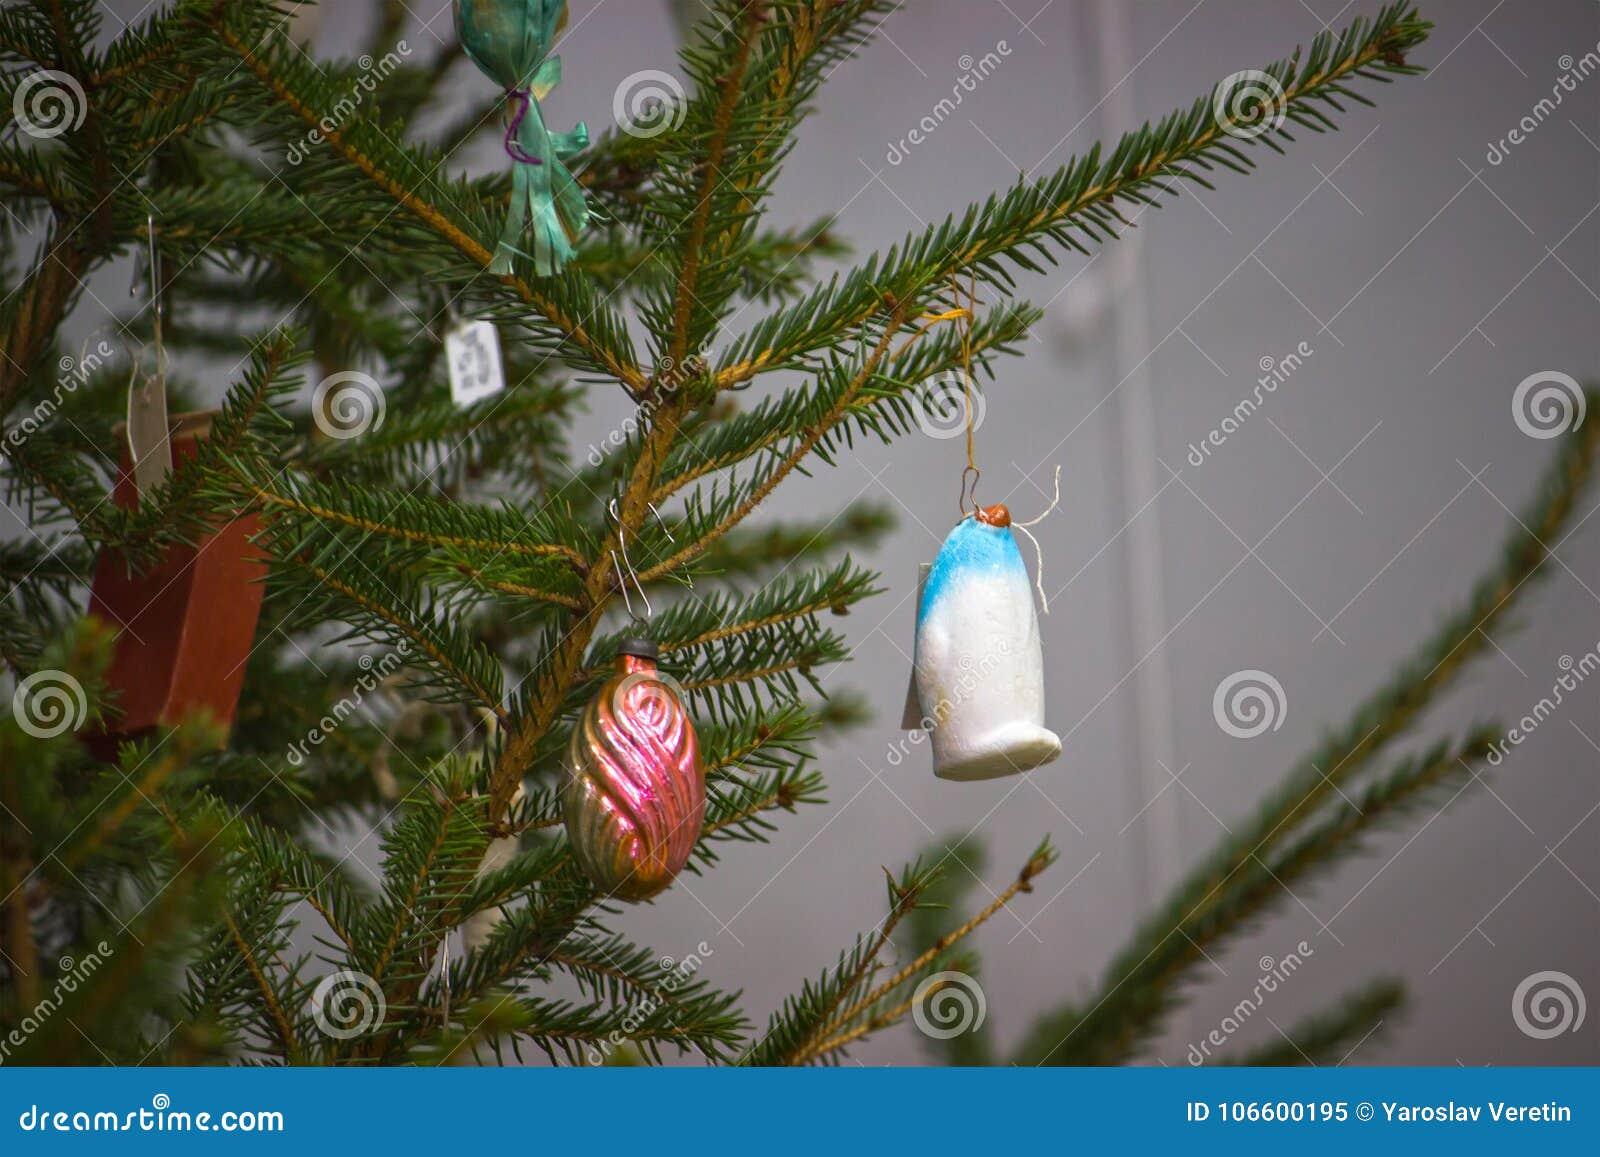 Soviet decorations hang on Christmas tree